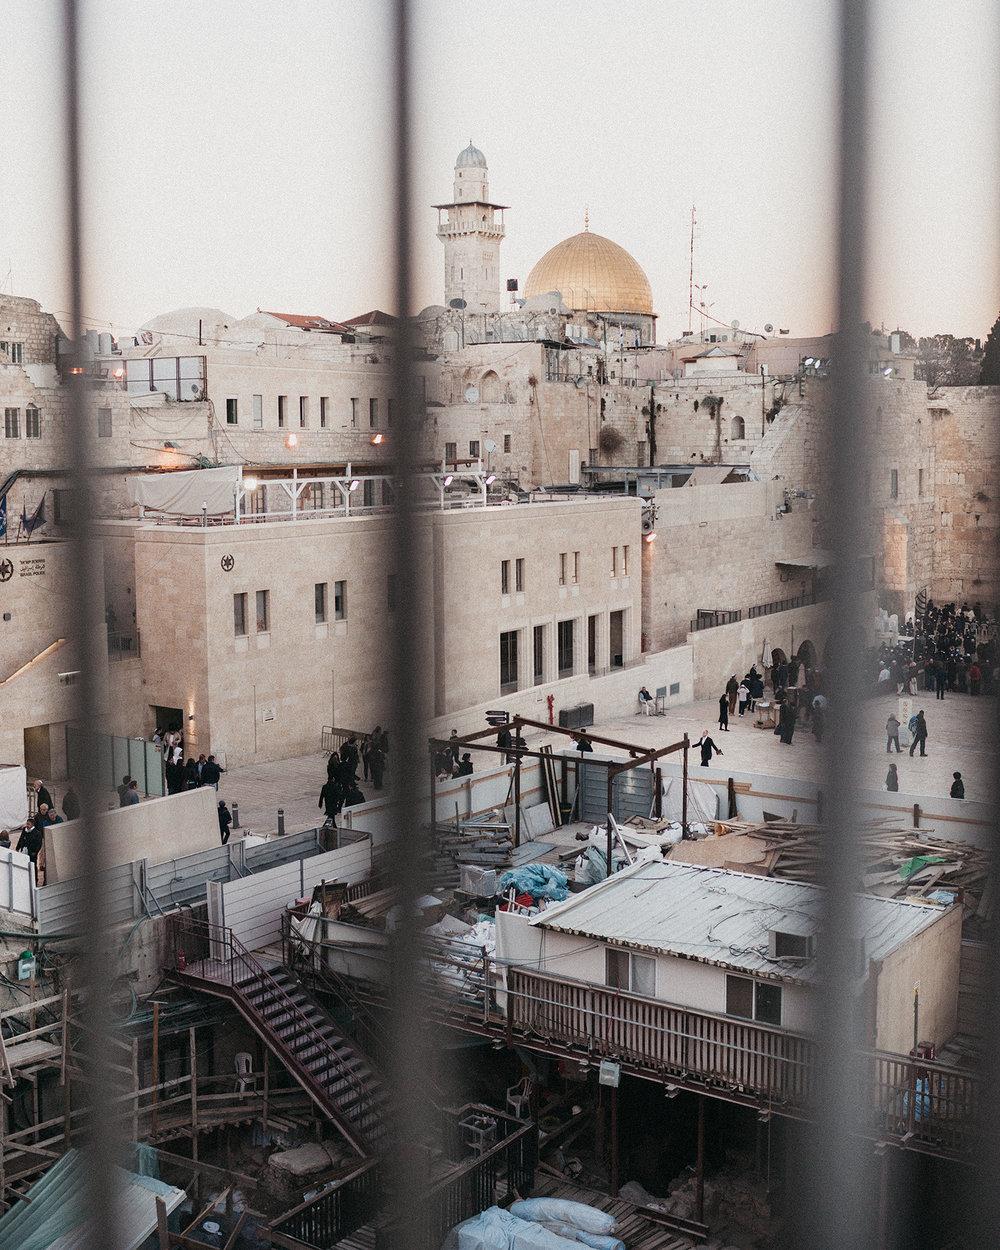 20171208_JERUSALEM_01_020.jpg